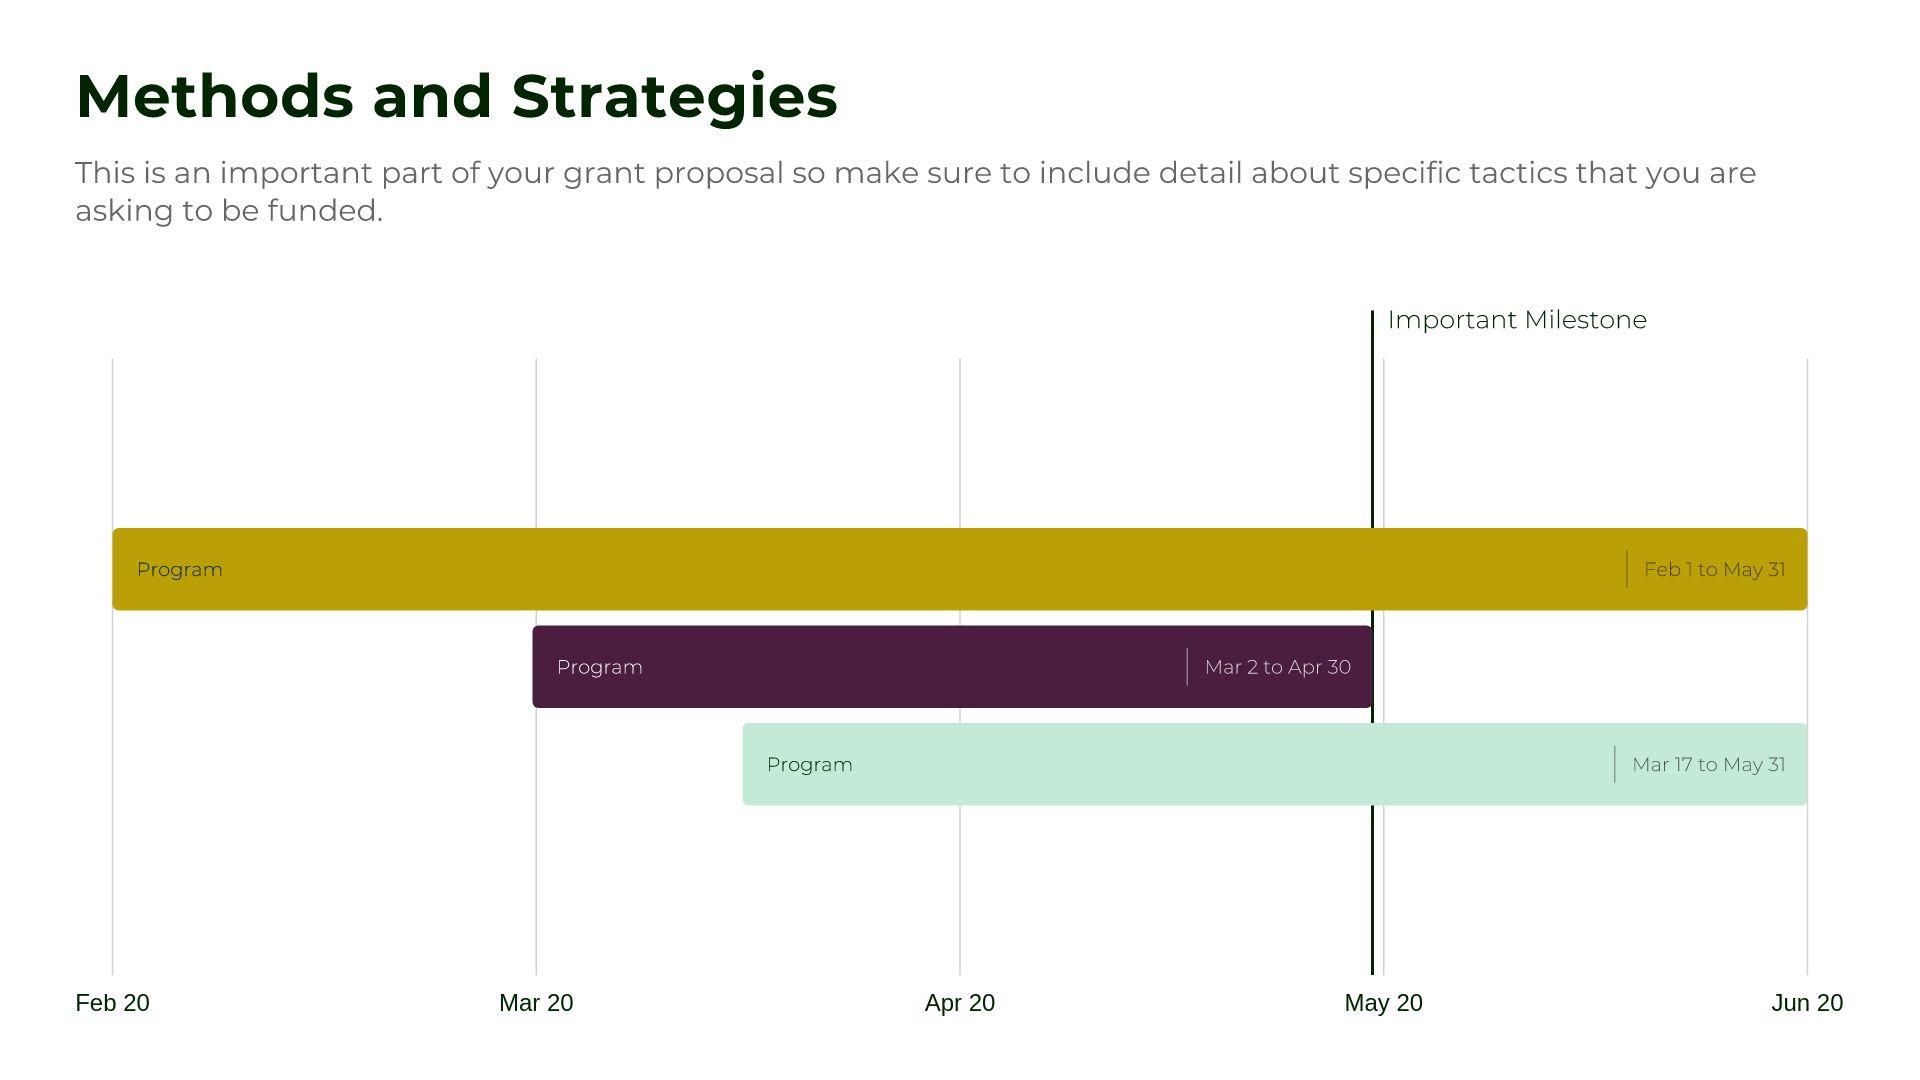 Methods and Strategies